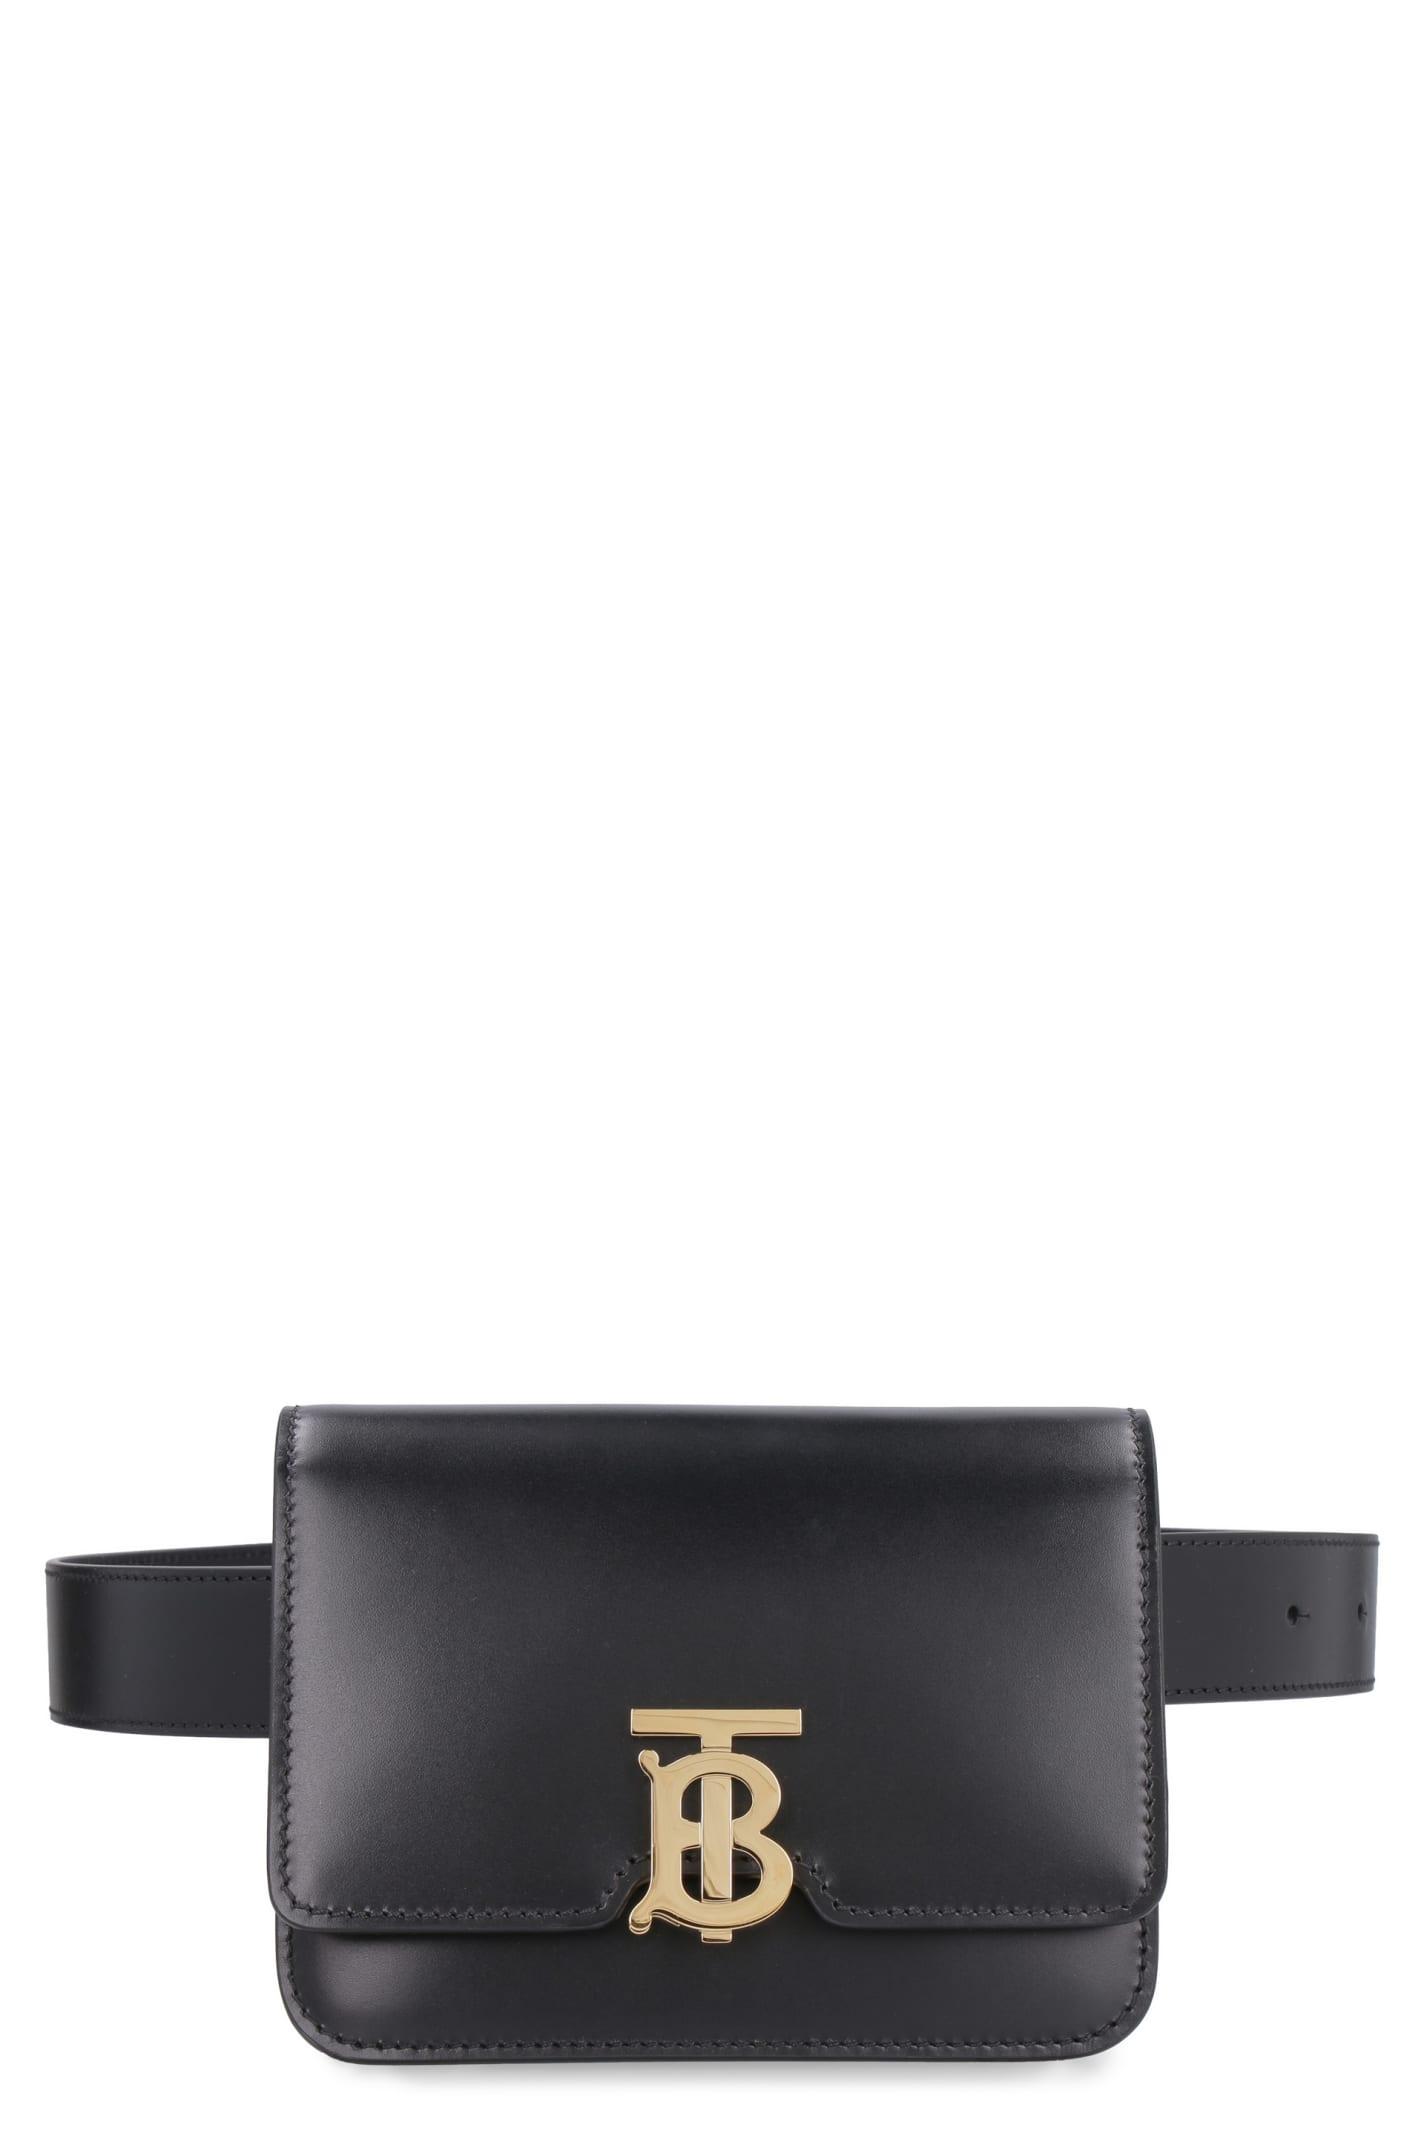 Burberry Tb Bag Leather Belt Bag